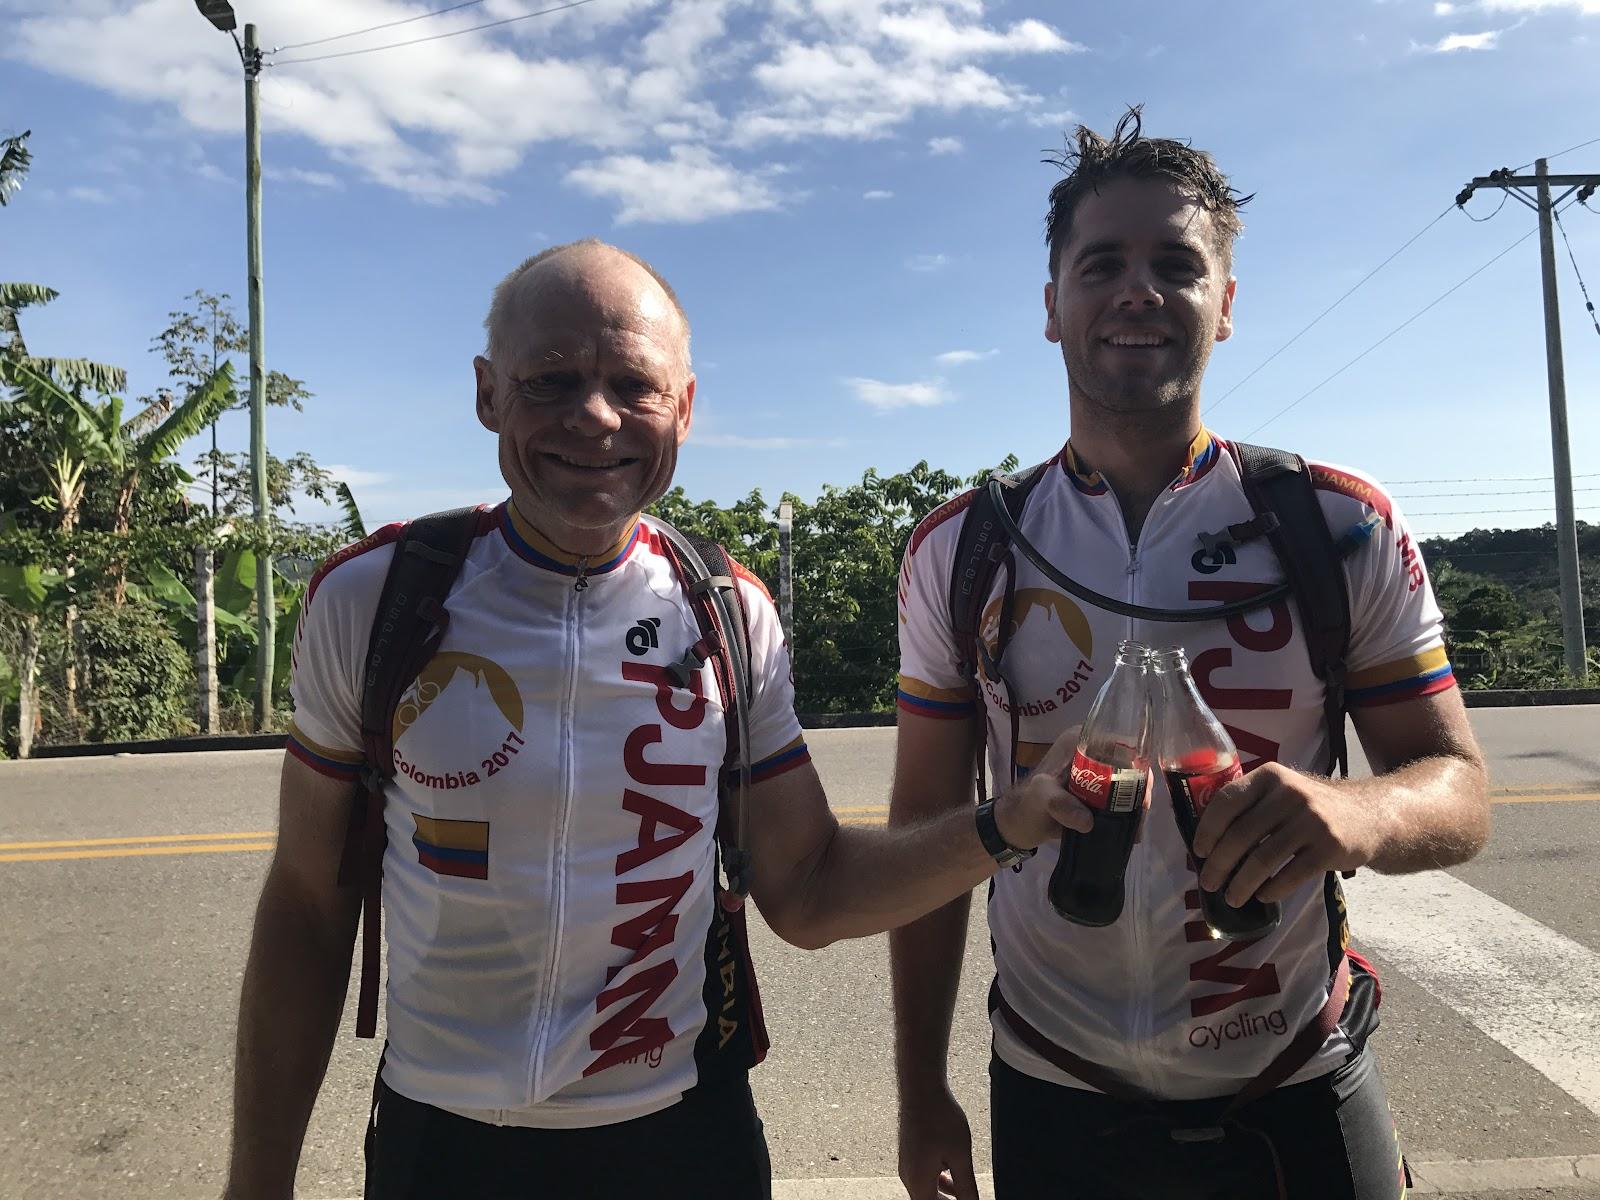 John Johnson and Will Plaugher at finish of Alto de Letras bike ride.